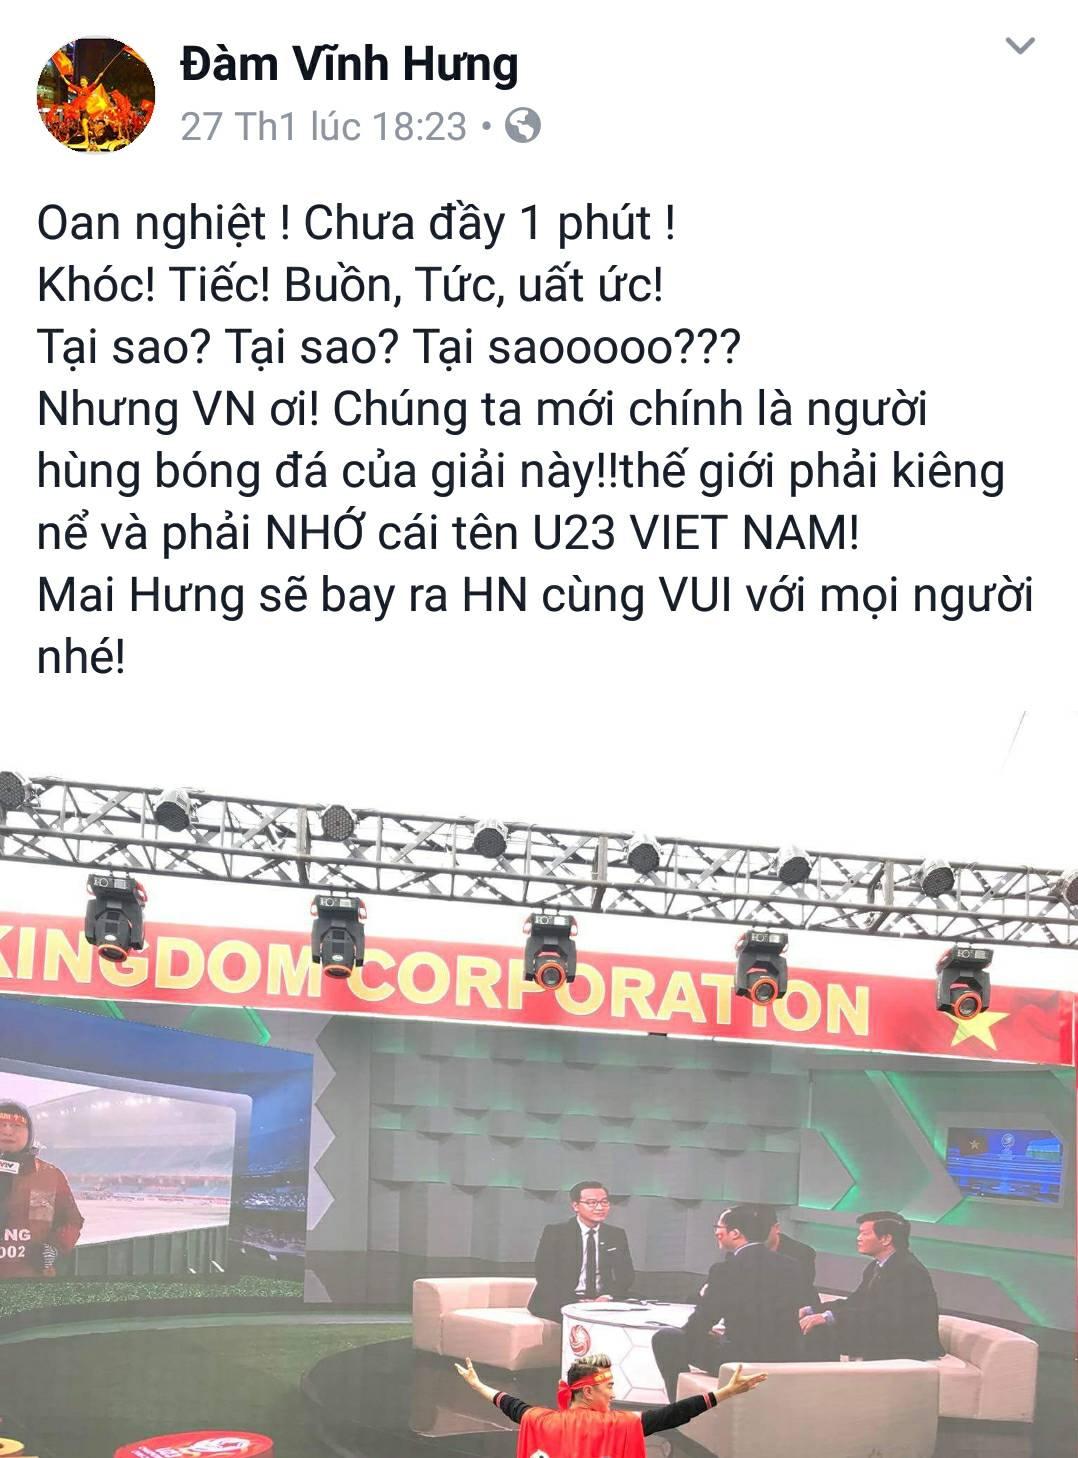 hoai-linh-dong-vien-u23-viet-nam-vi-cup-vo-dich-nhu-chiec-ly-uong-bia-gay-bao